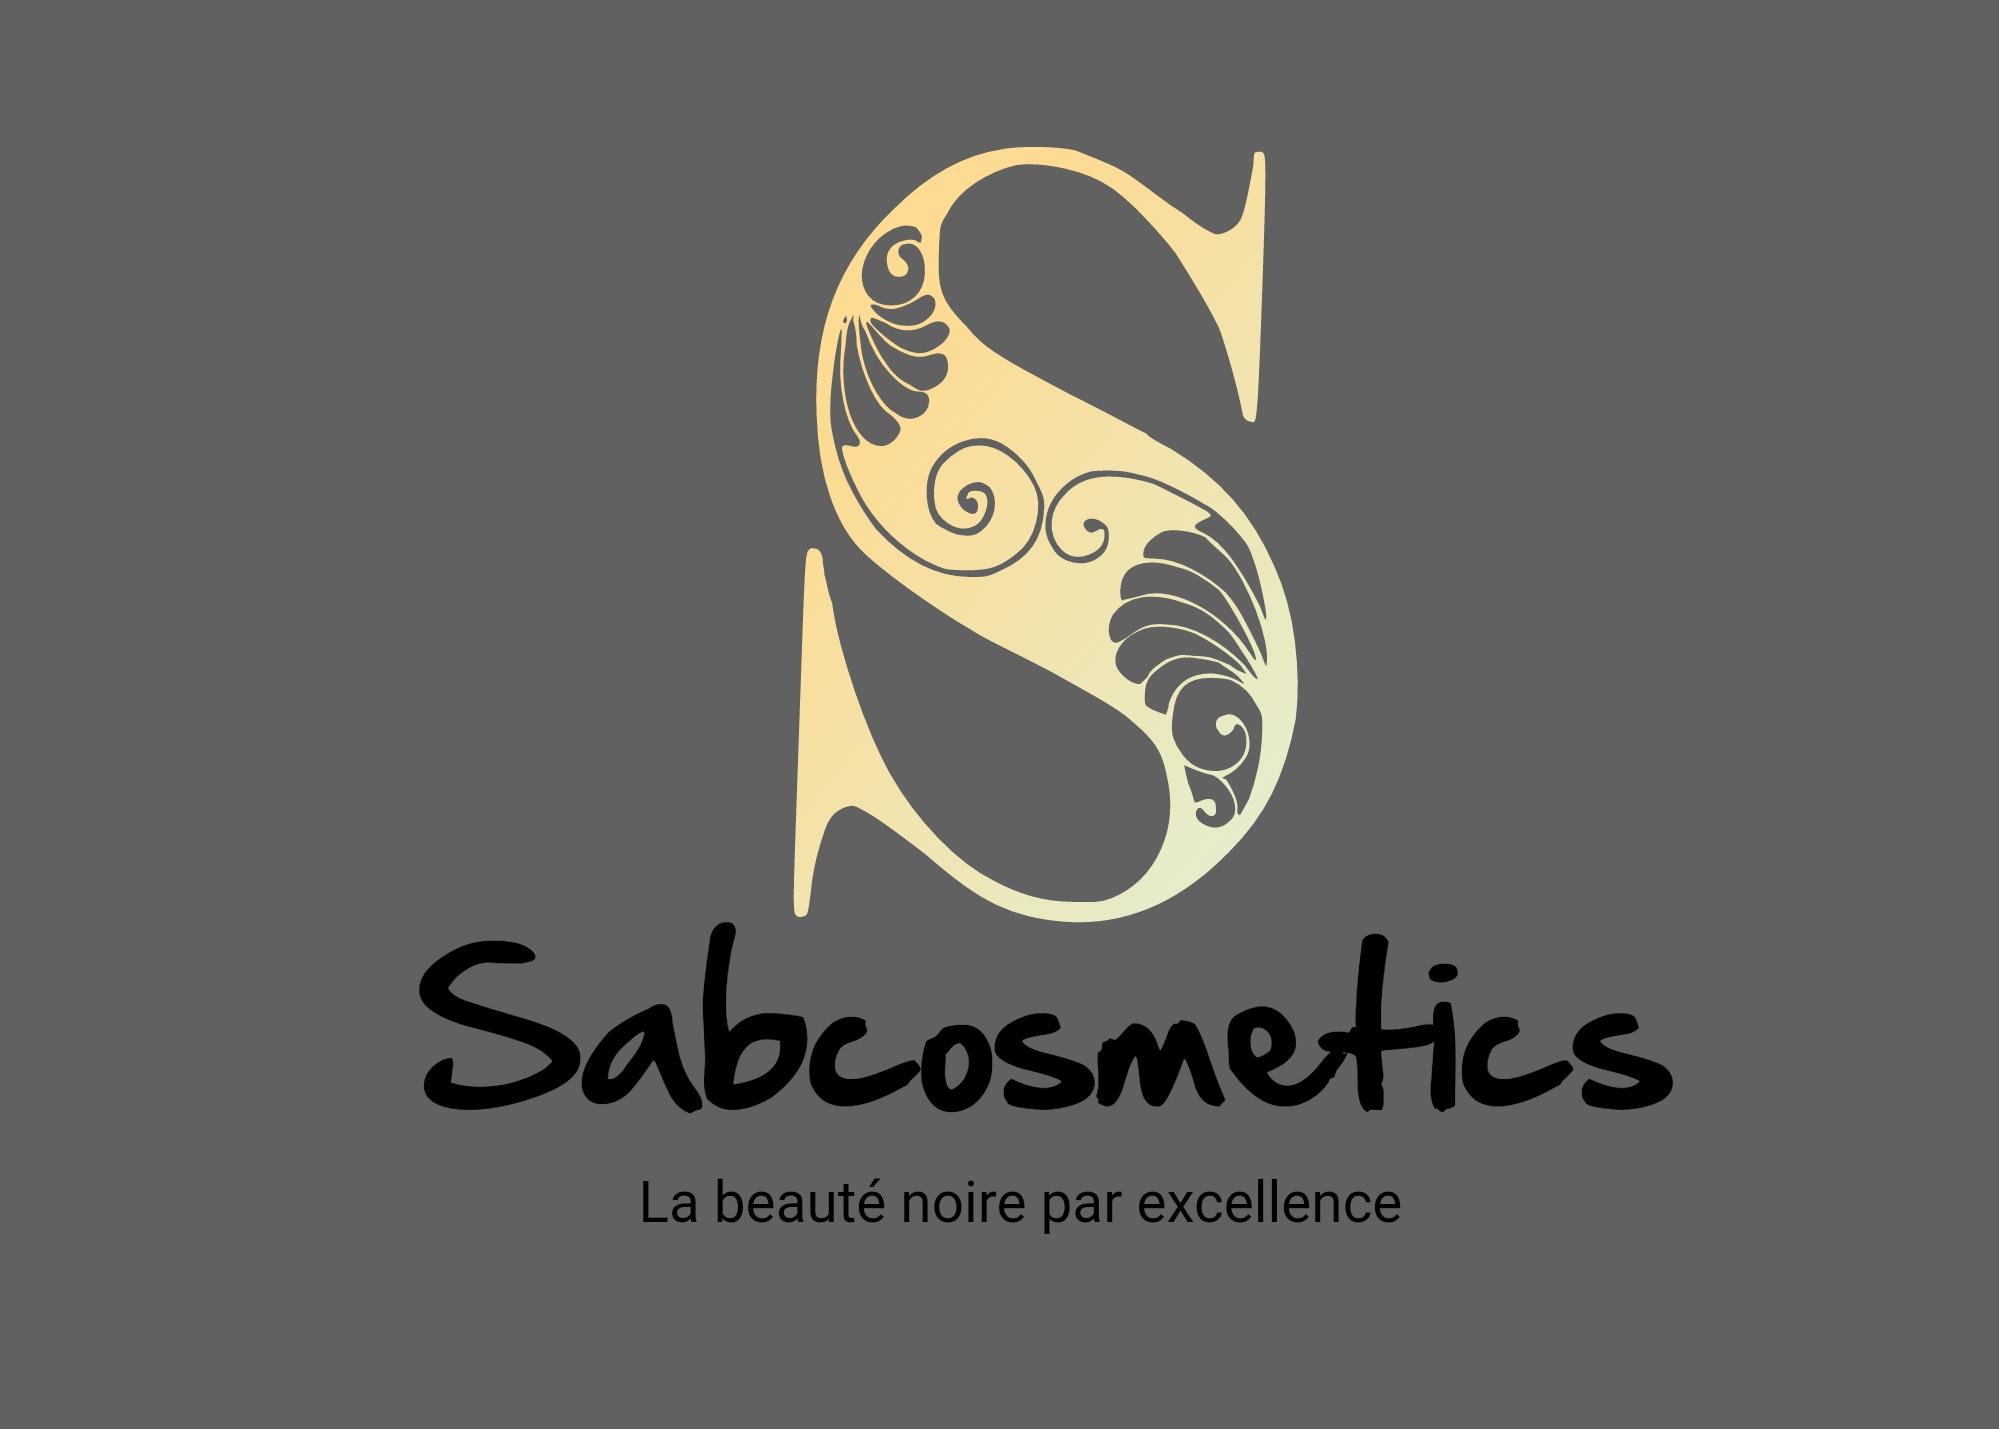 sab-cosmetics